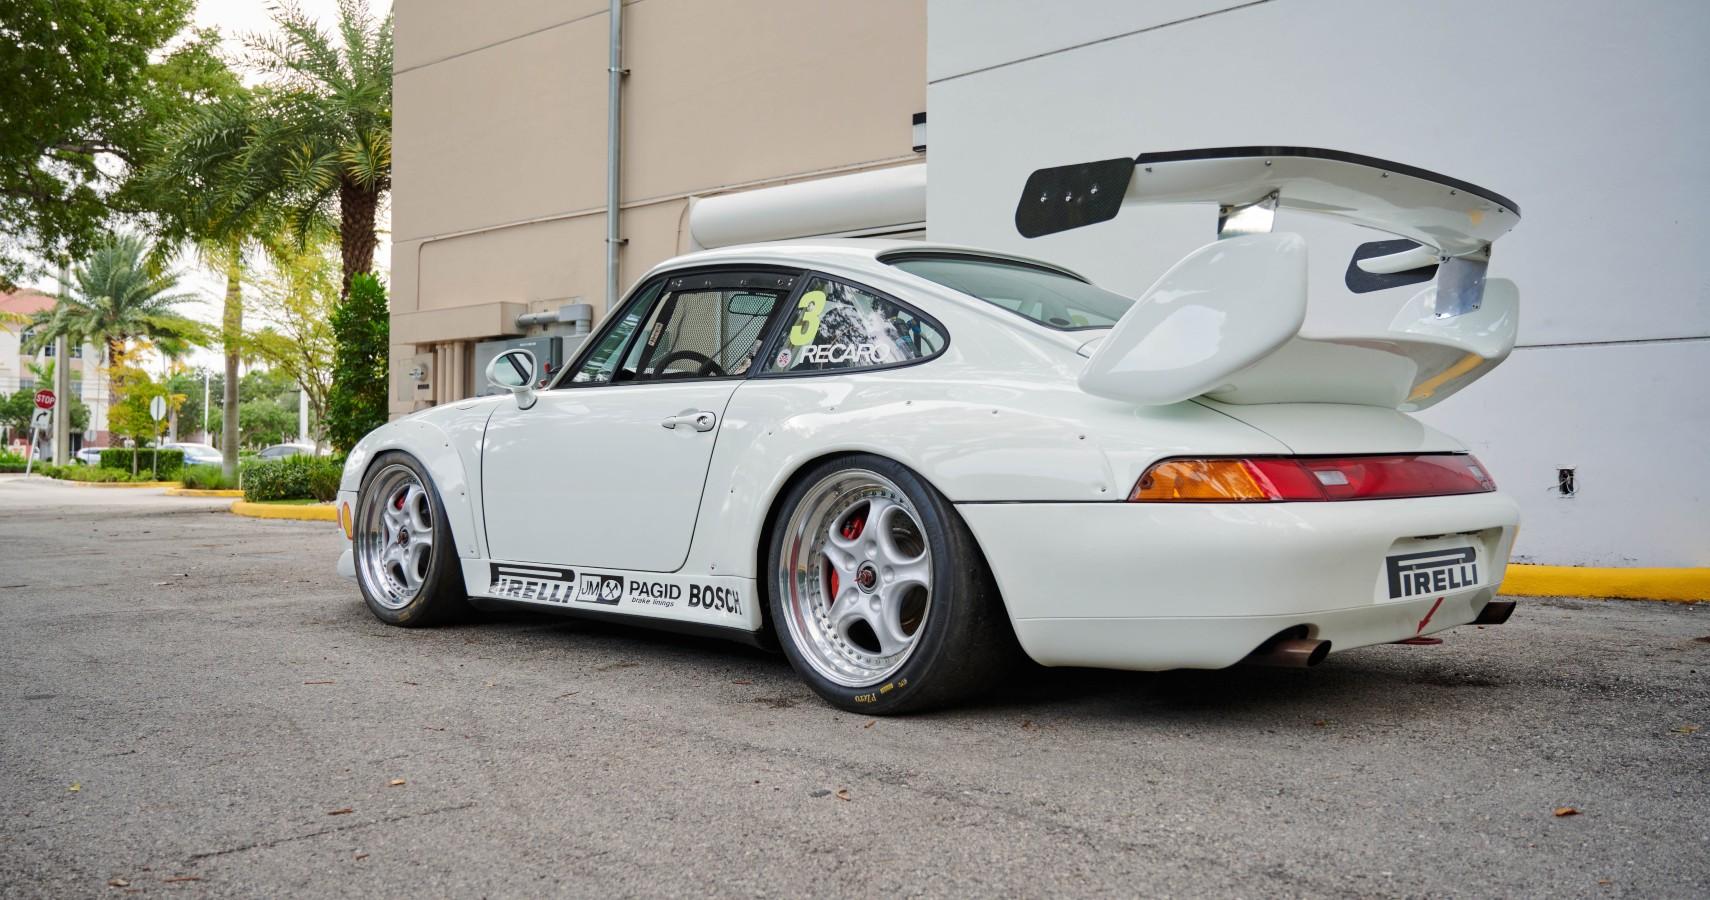 Super Rare Porsche 911 Cup 3.8 RSR Evo Up for Auction